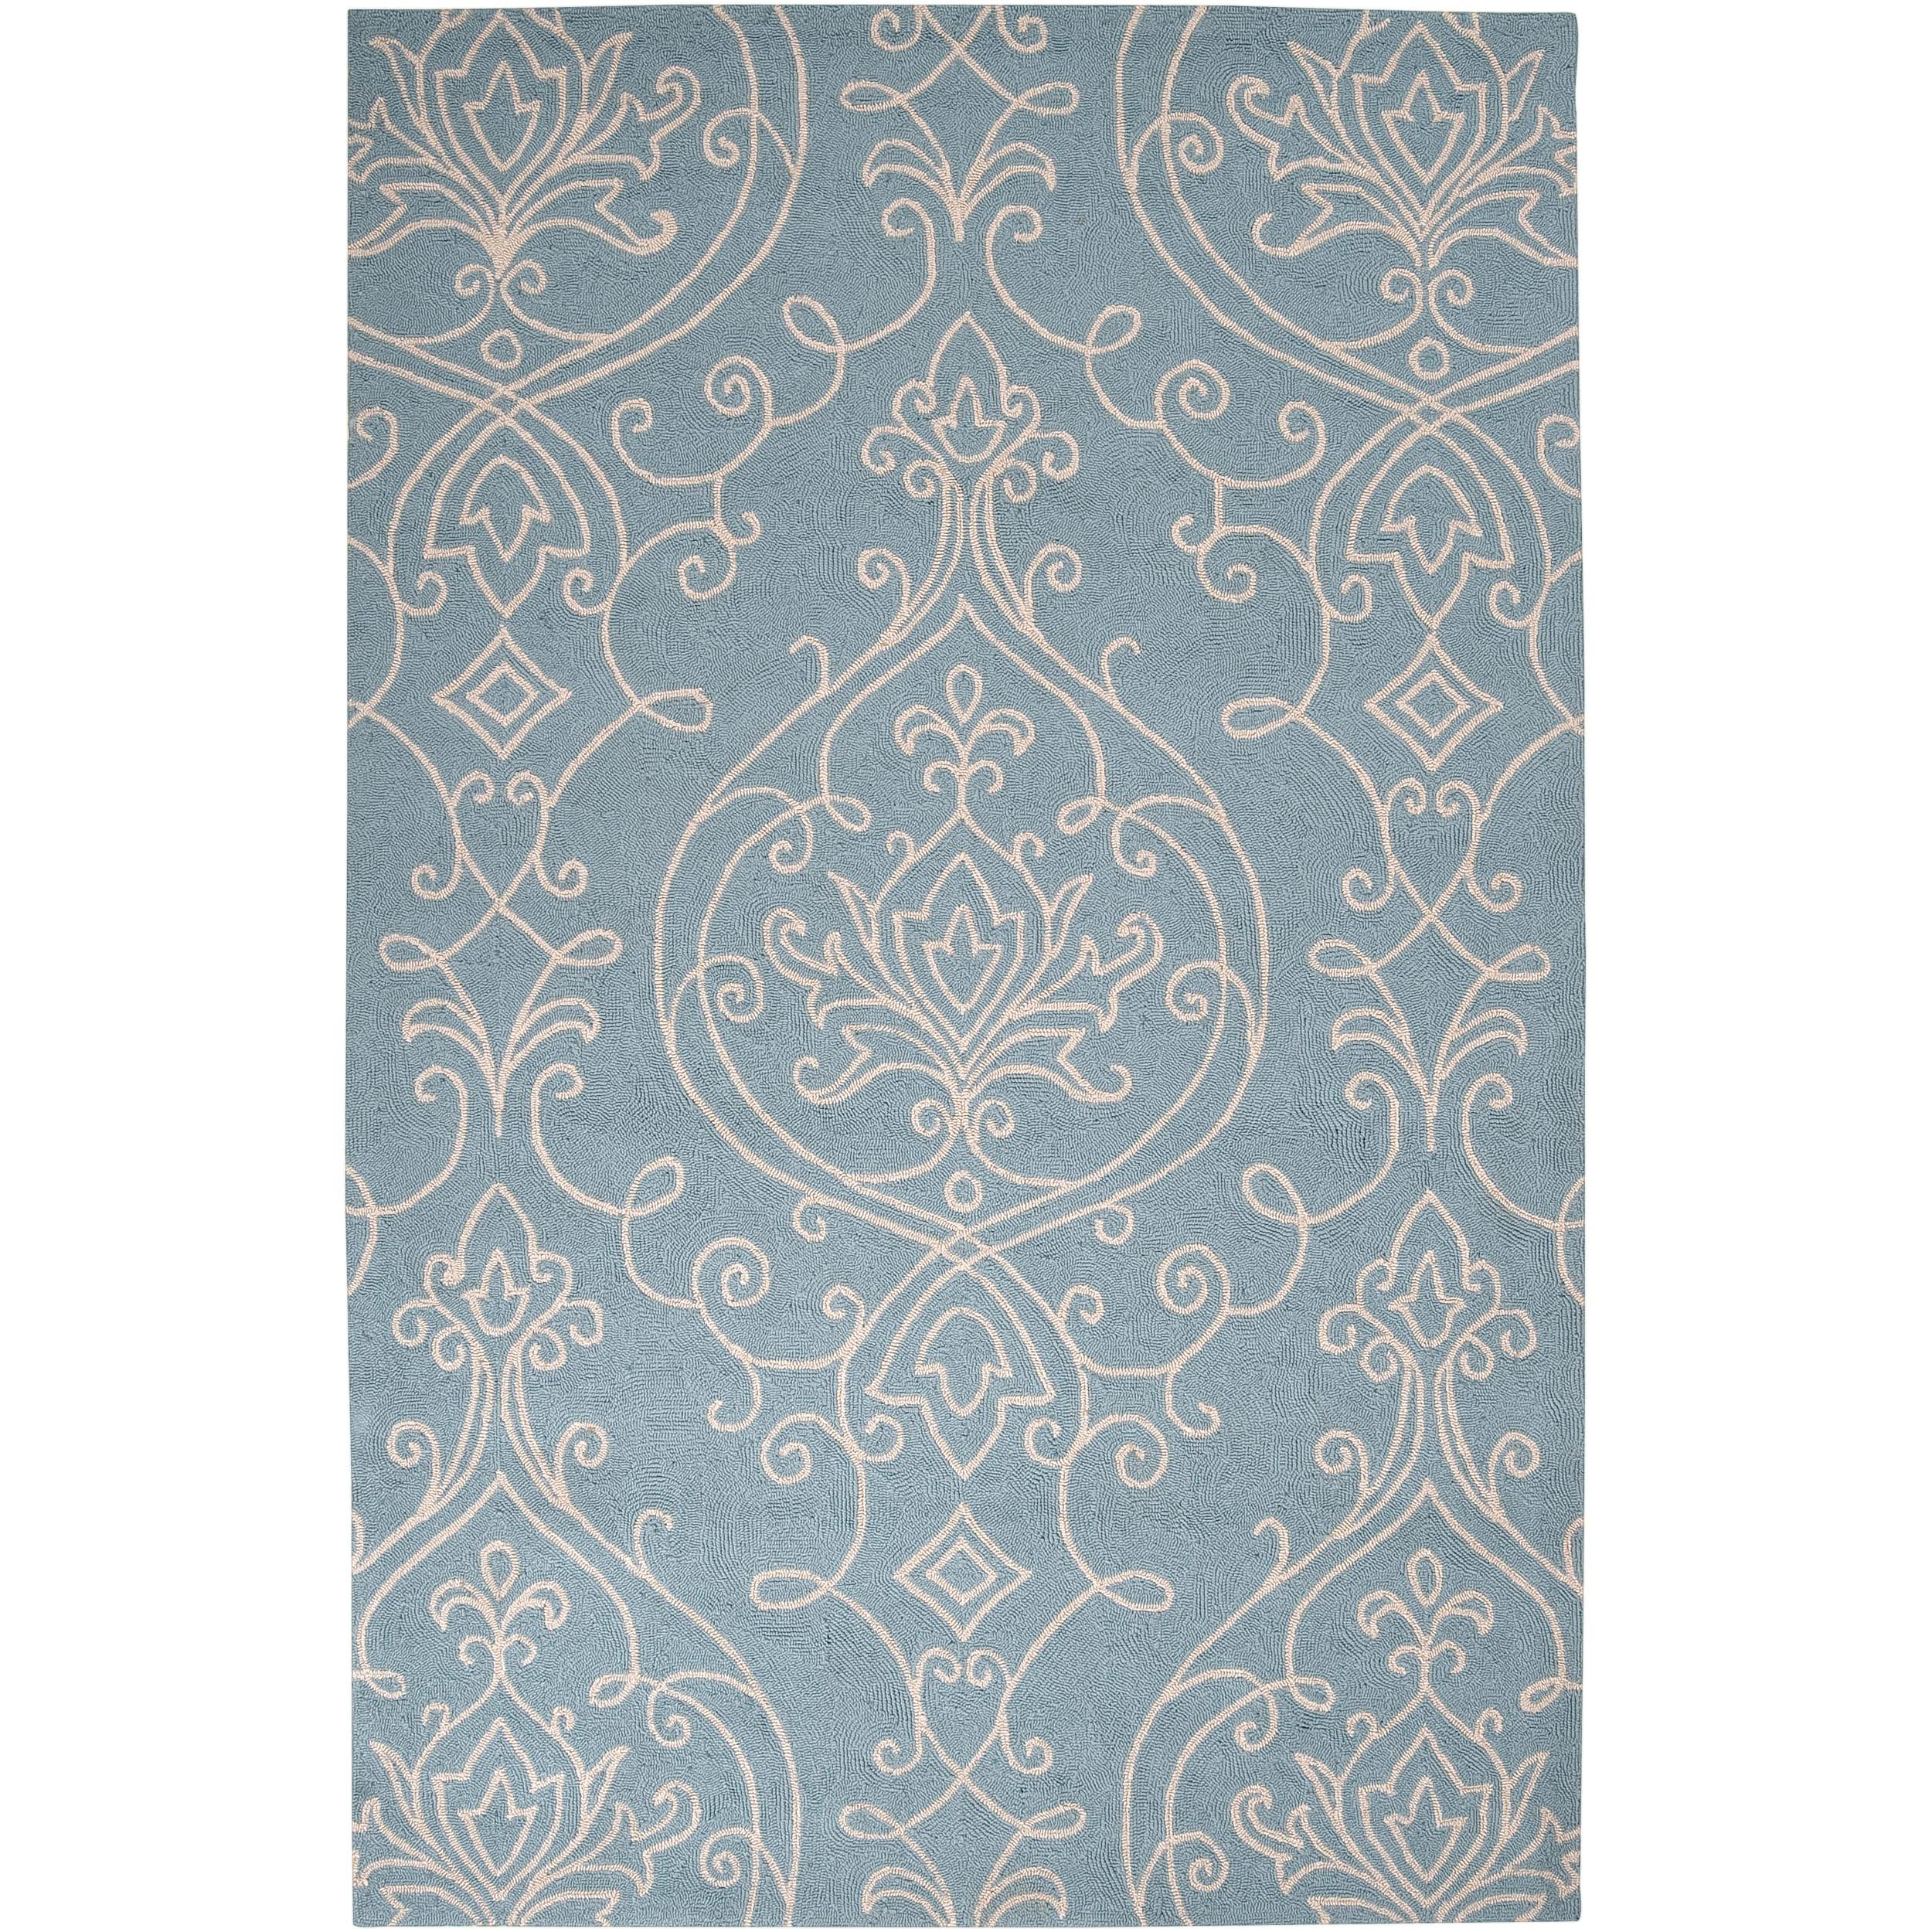 Hand-hooked Blue Radiant Indoor/Outdoor Damask Print Rug (3' x 5')